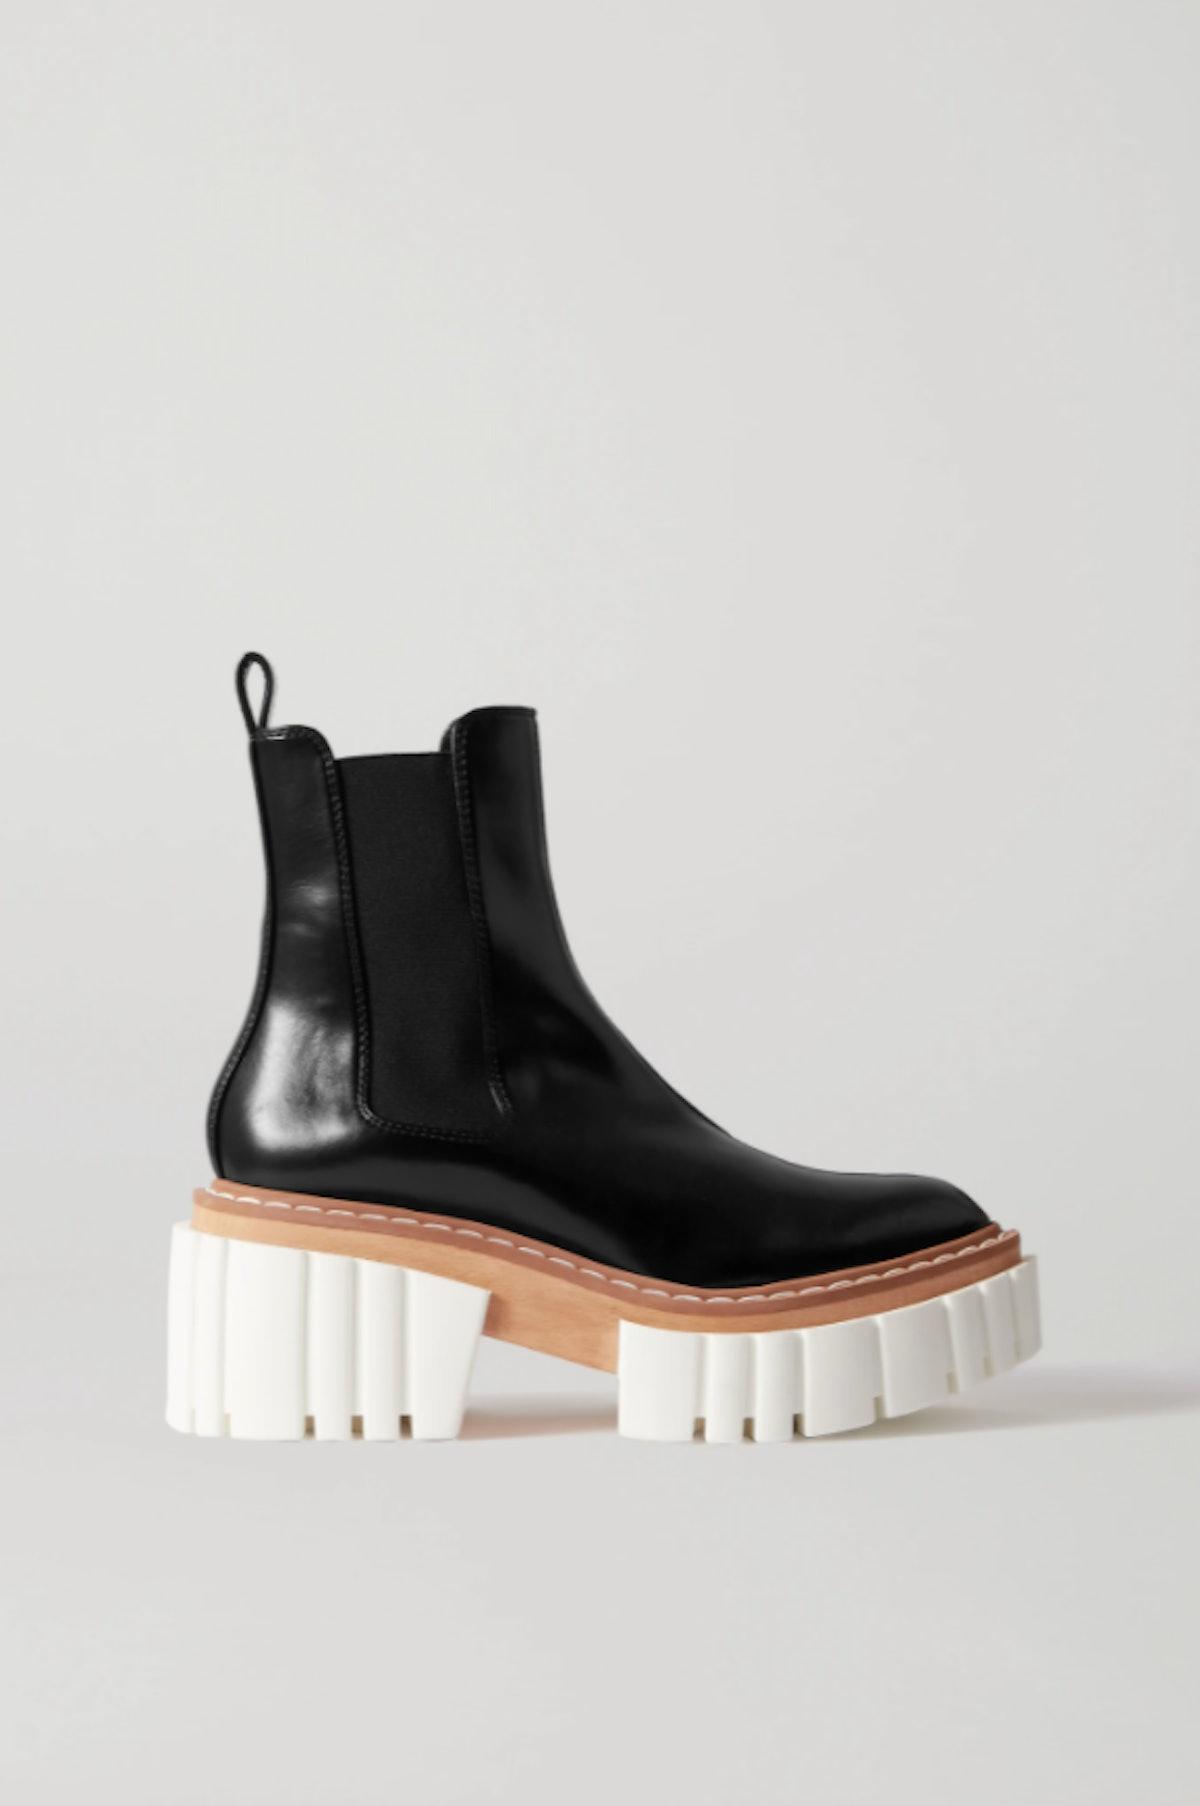 Stella McCartney's Emilie Leather Platform Chelsea Boots.